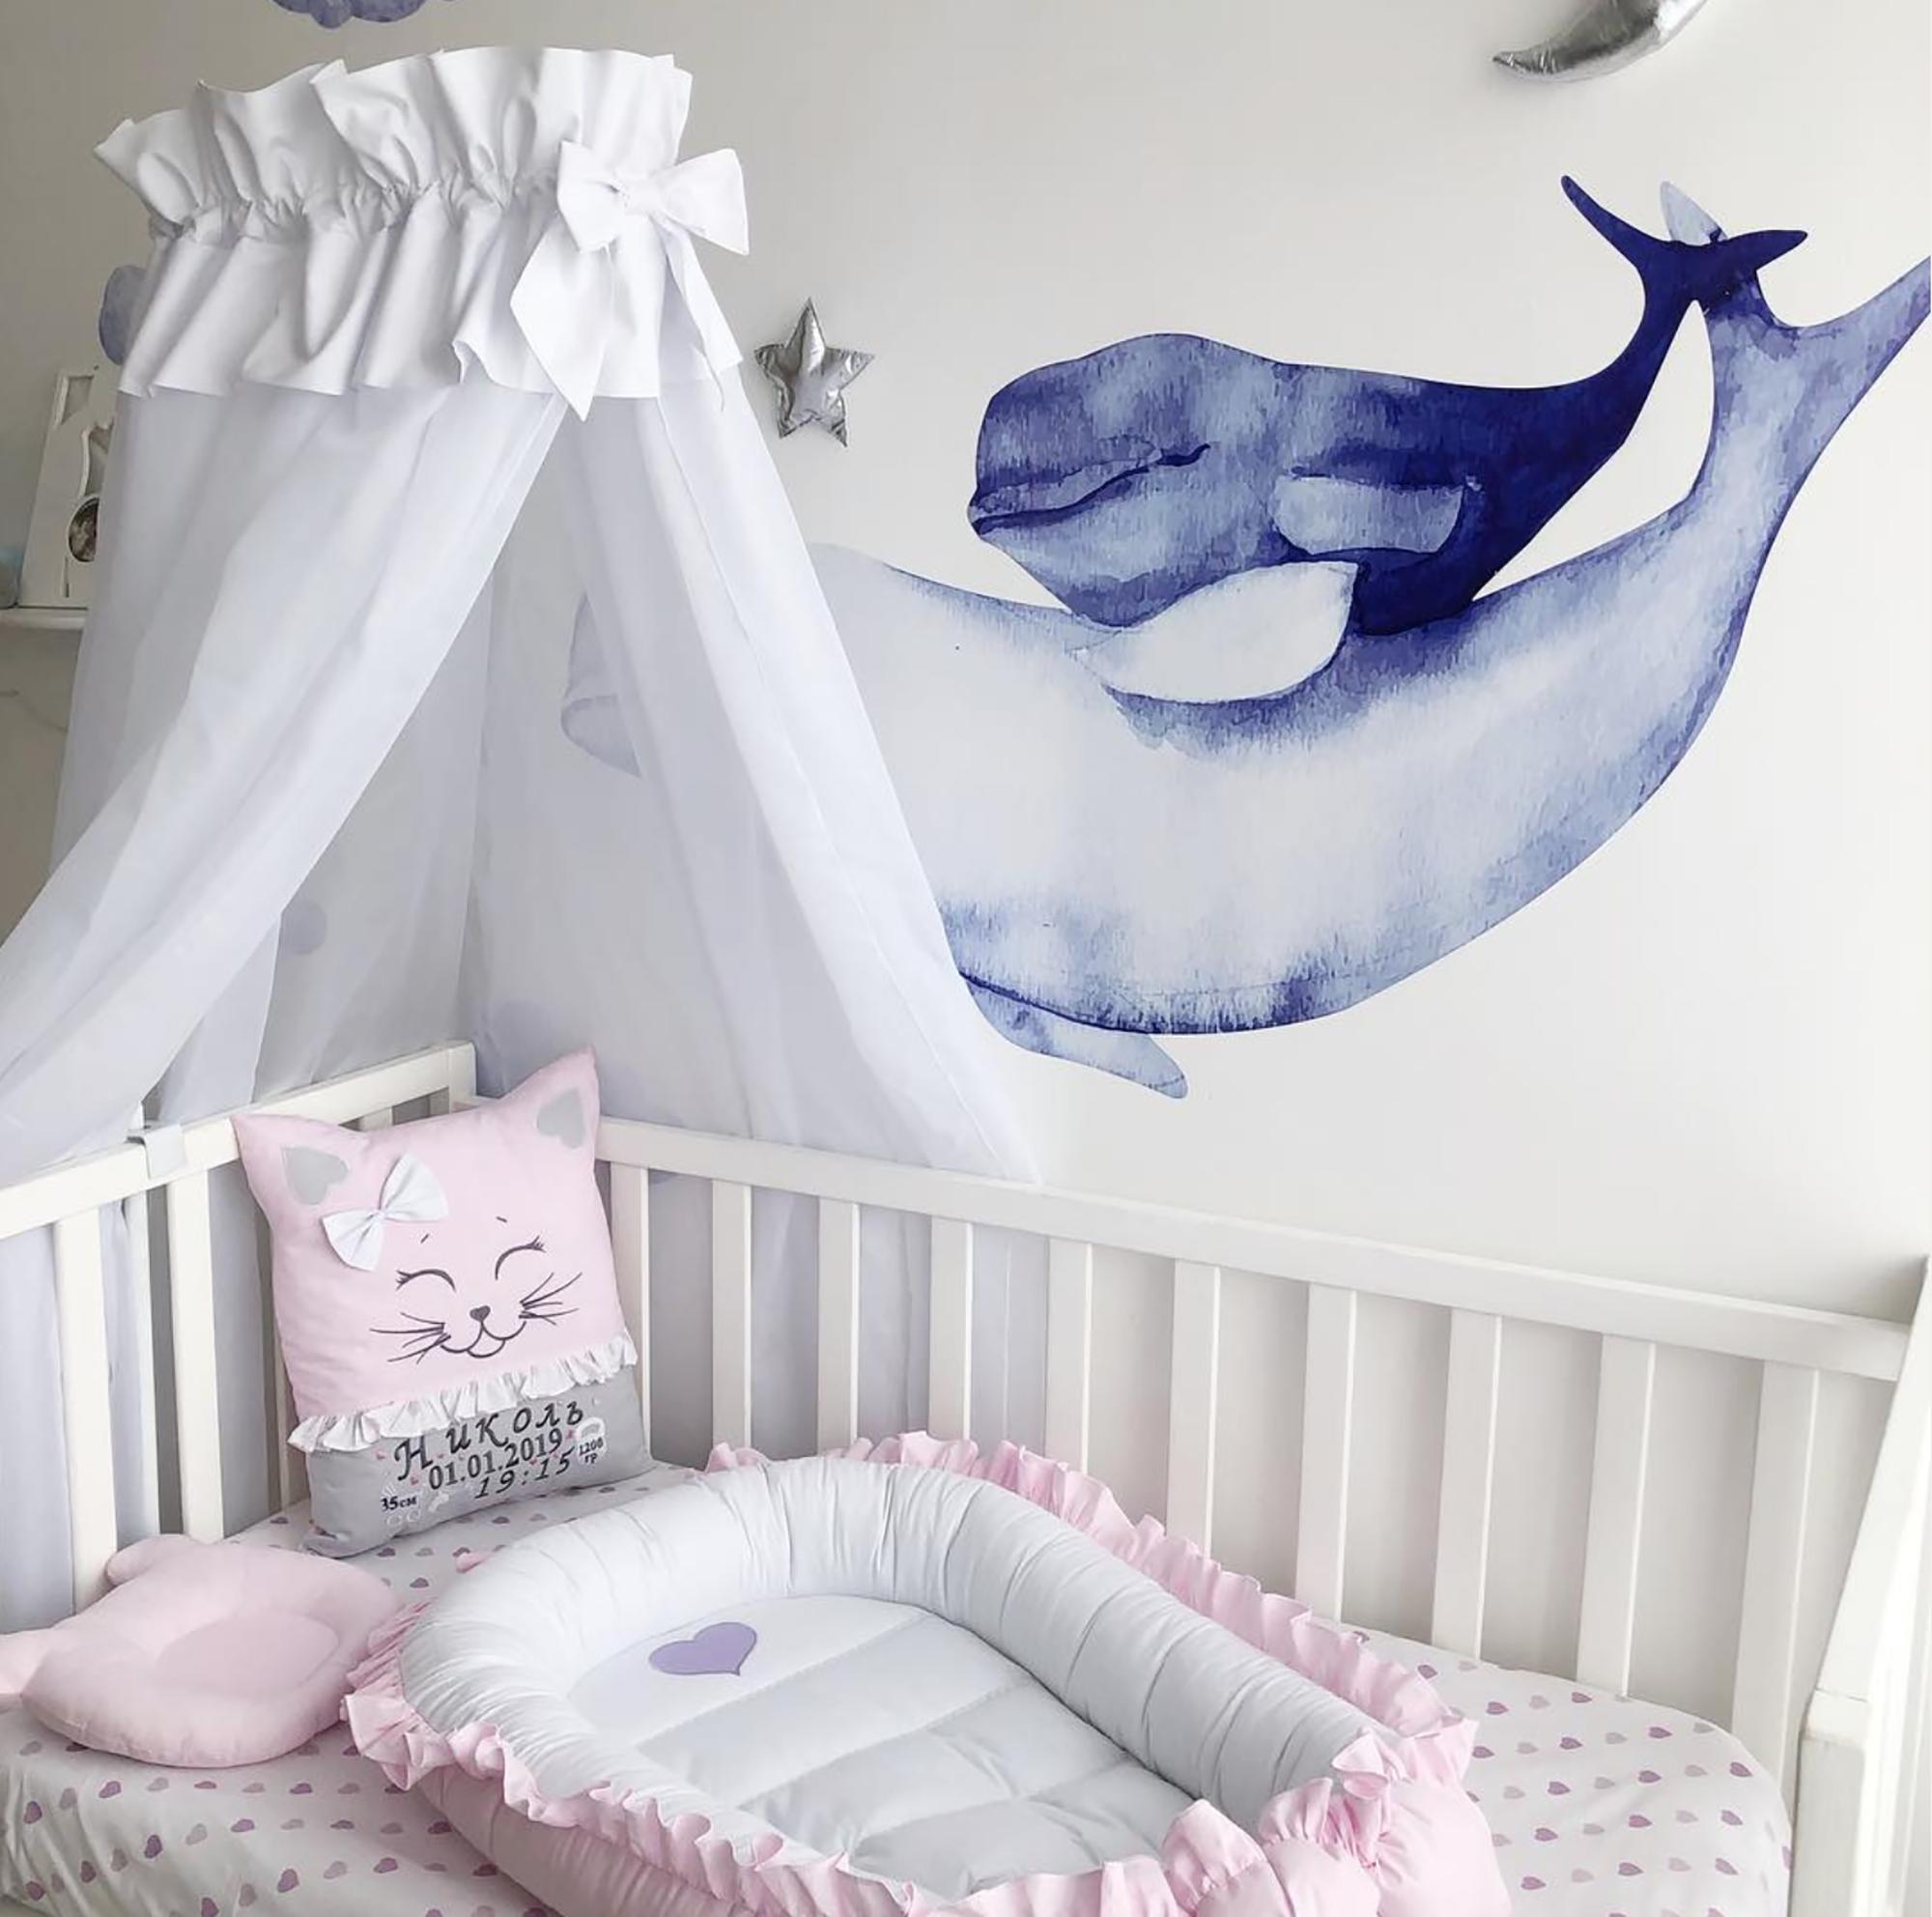 Nursery Canopy Bed Canopy Baldachin Canopy Tent Crib Canopy